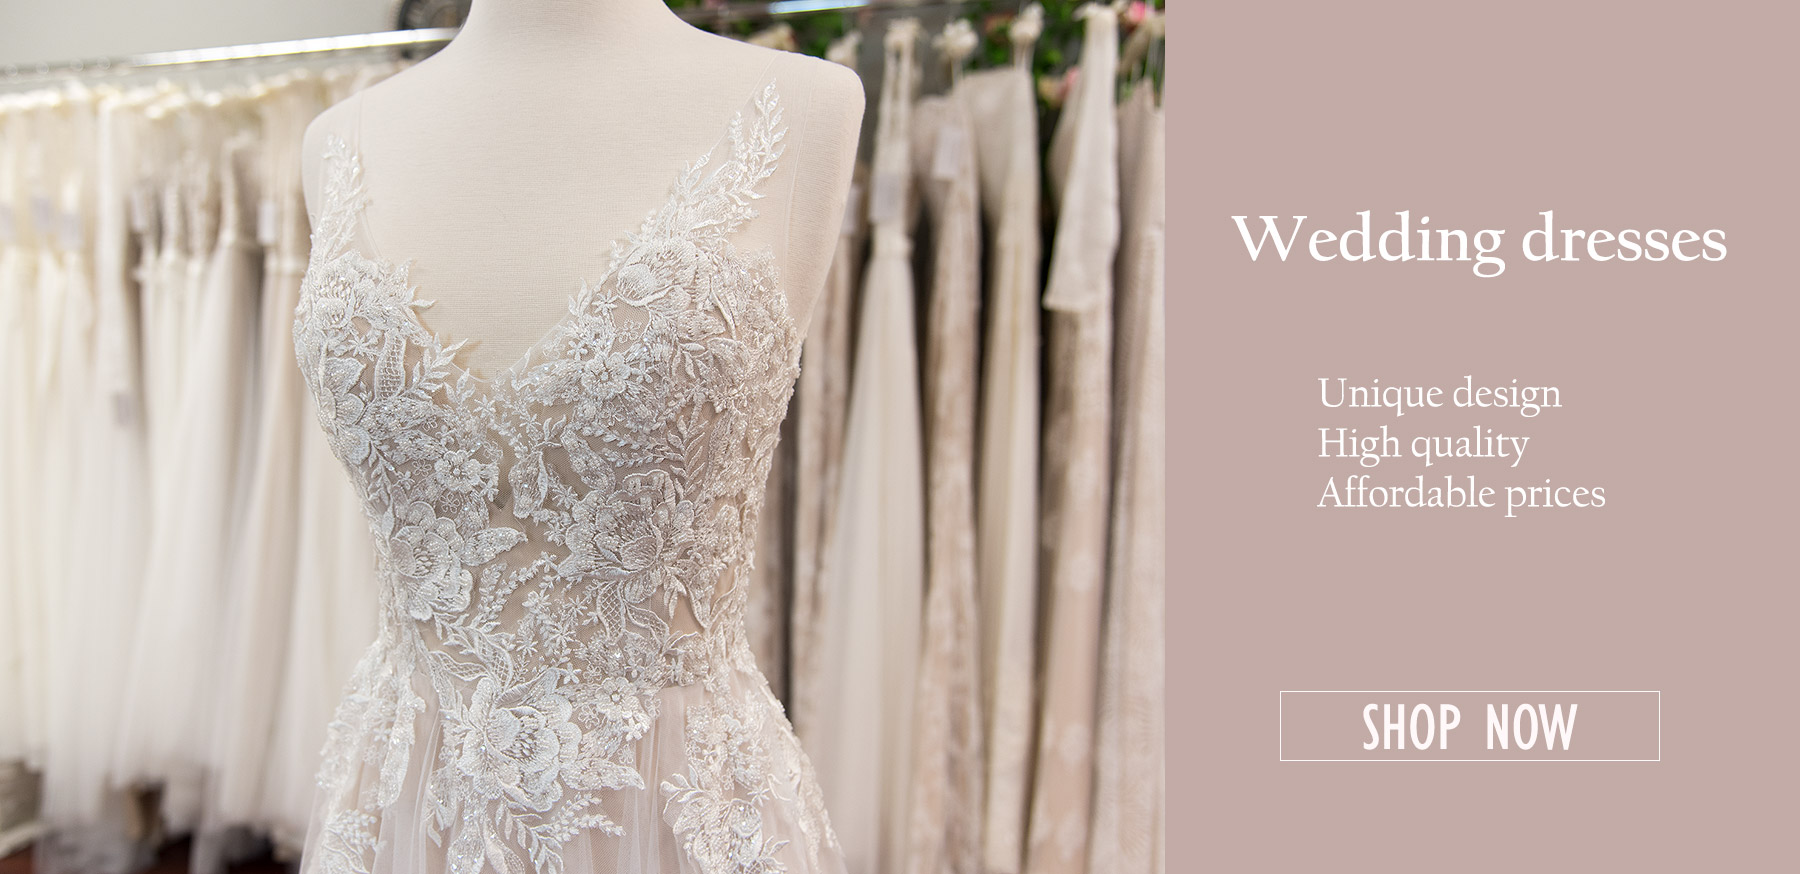 Wedding Dresses Wedding Bolero Jacket Wedding Veil,Wedding Guest Plus Size Evening Dresses South Africa